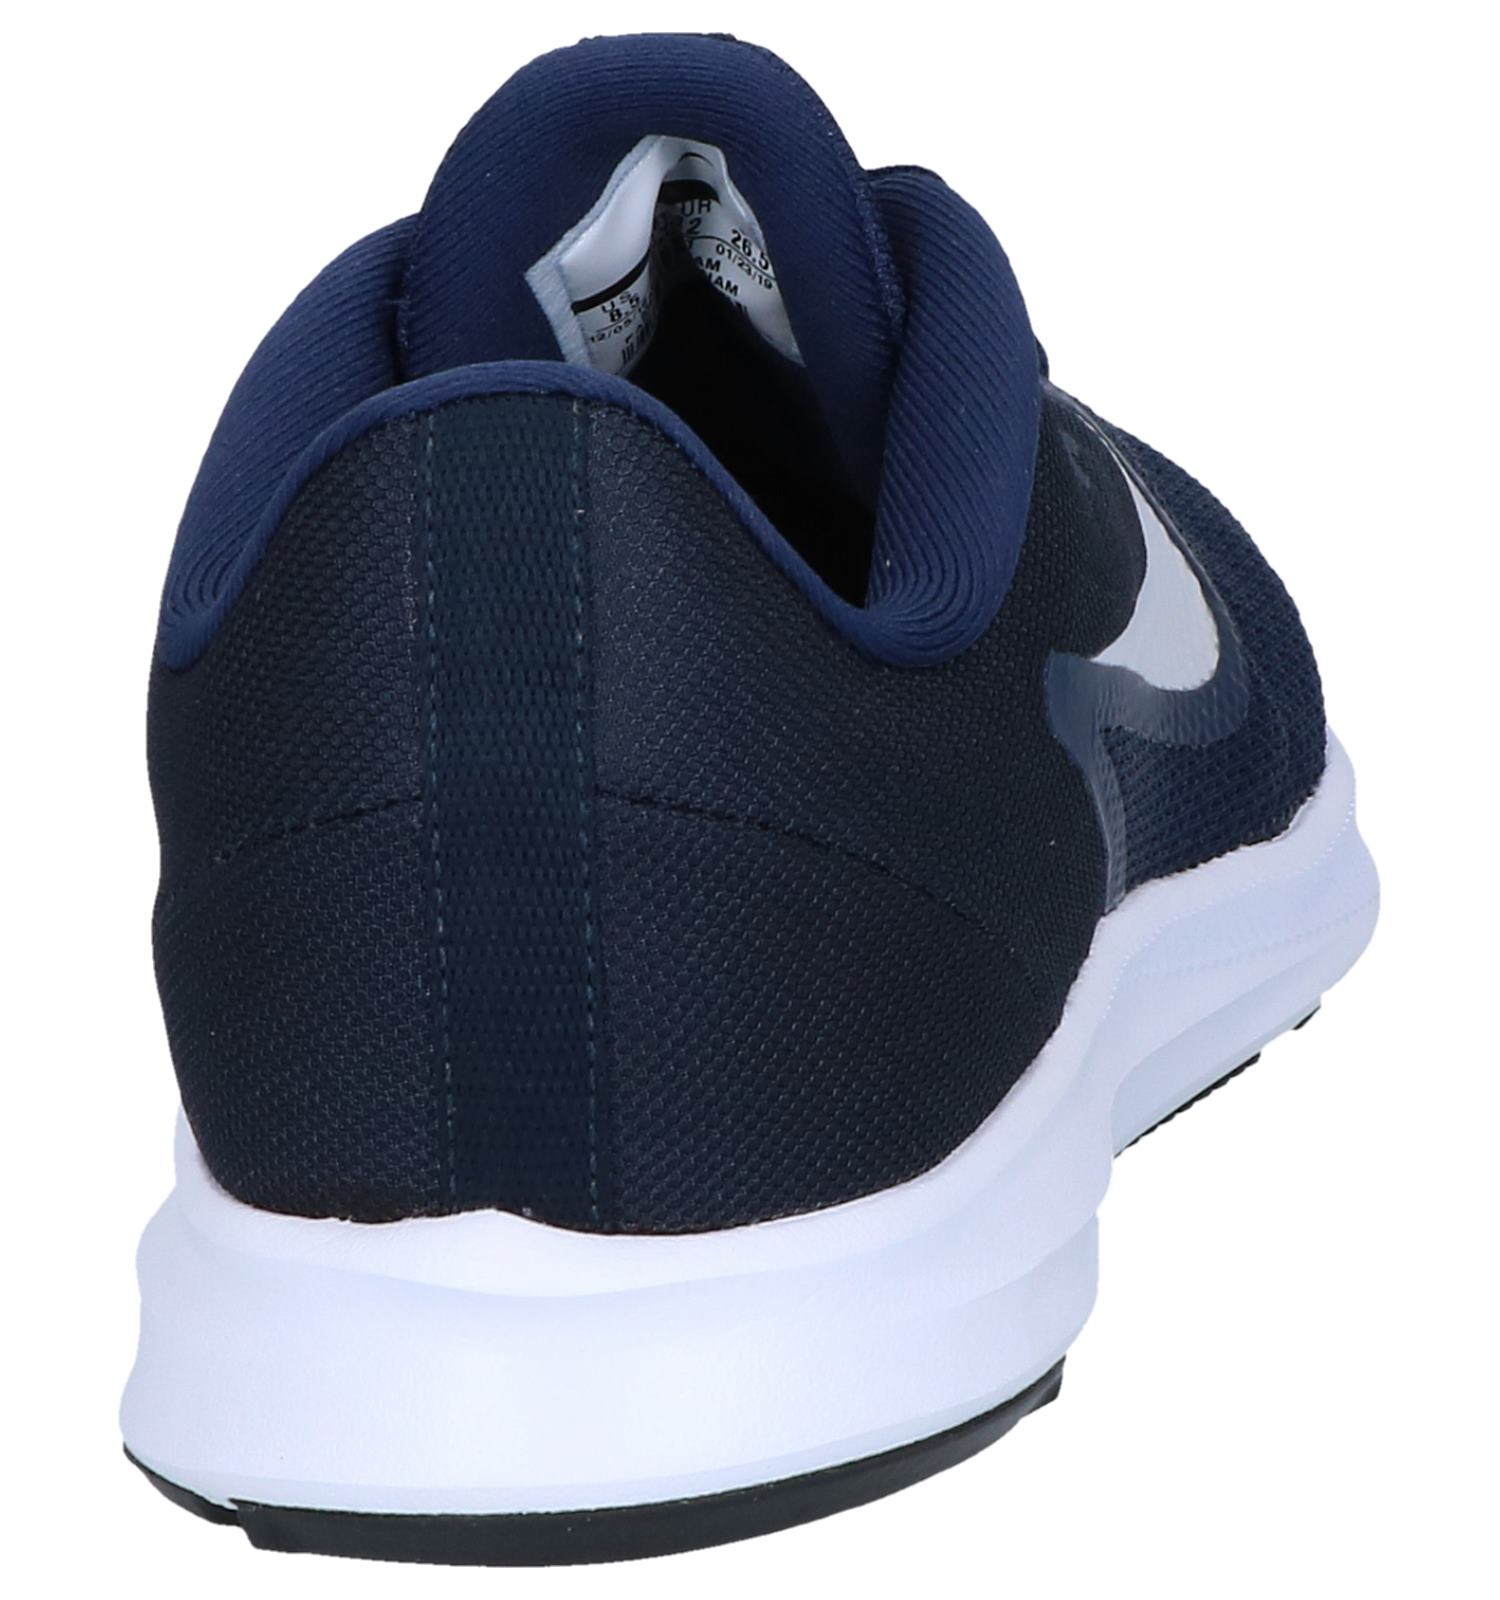 843b99e35fad9d Donkerblauwe Runners Nike Downshifter 9 | TORFS.BE | Gratis verzend en  retour